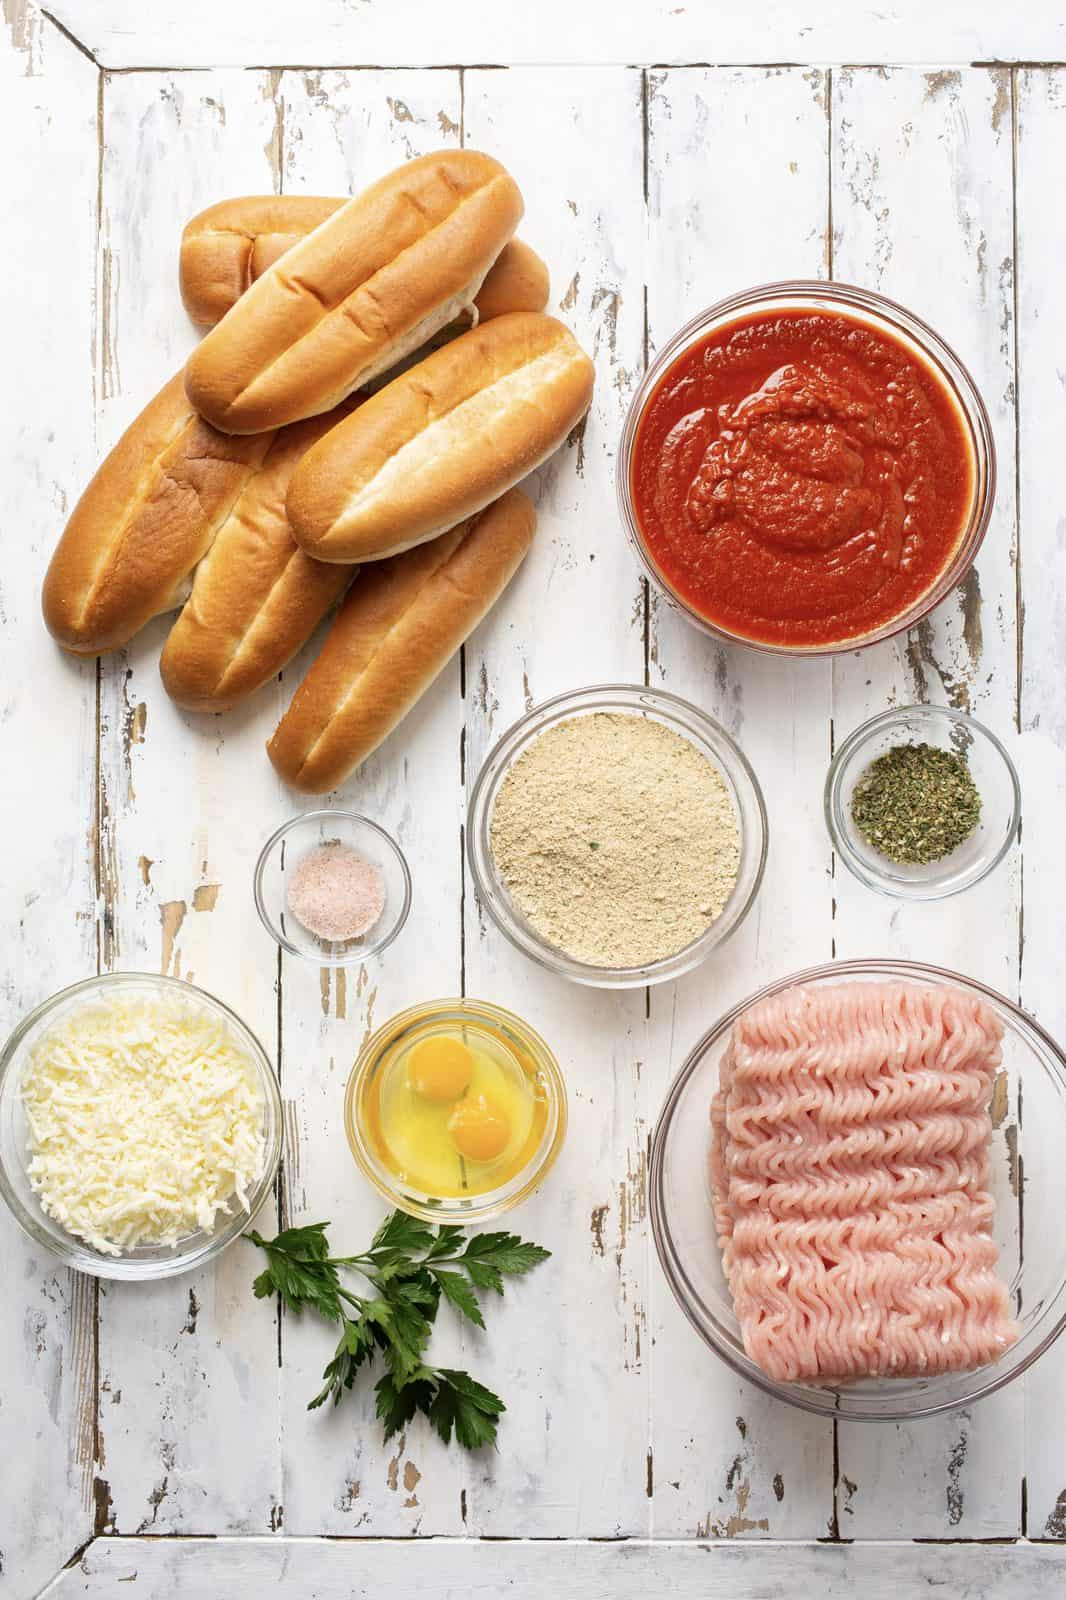 Ingredients needed: lean ground turkey, Italian bread crumbs eggs, italian seasoning, salt, marinara or pasta sauce, sub rolls, mozzarella cheese and fresh parsley.